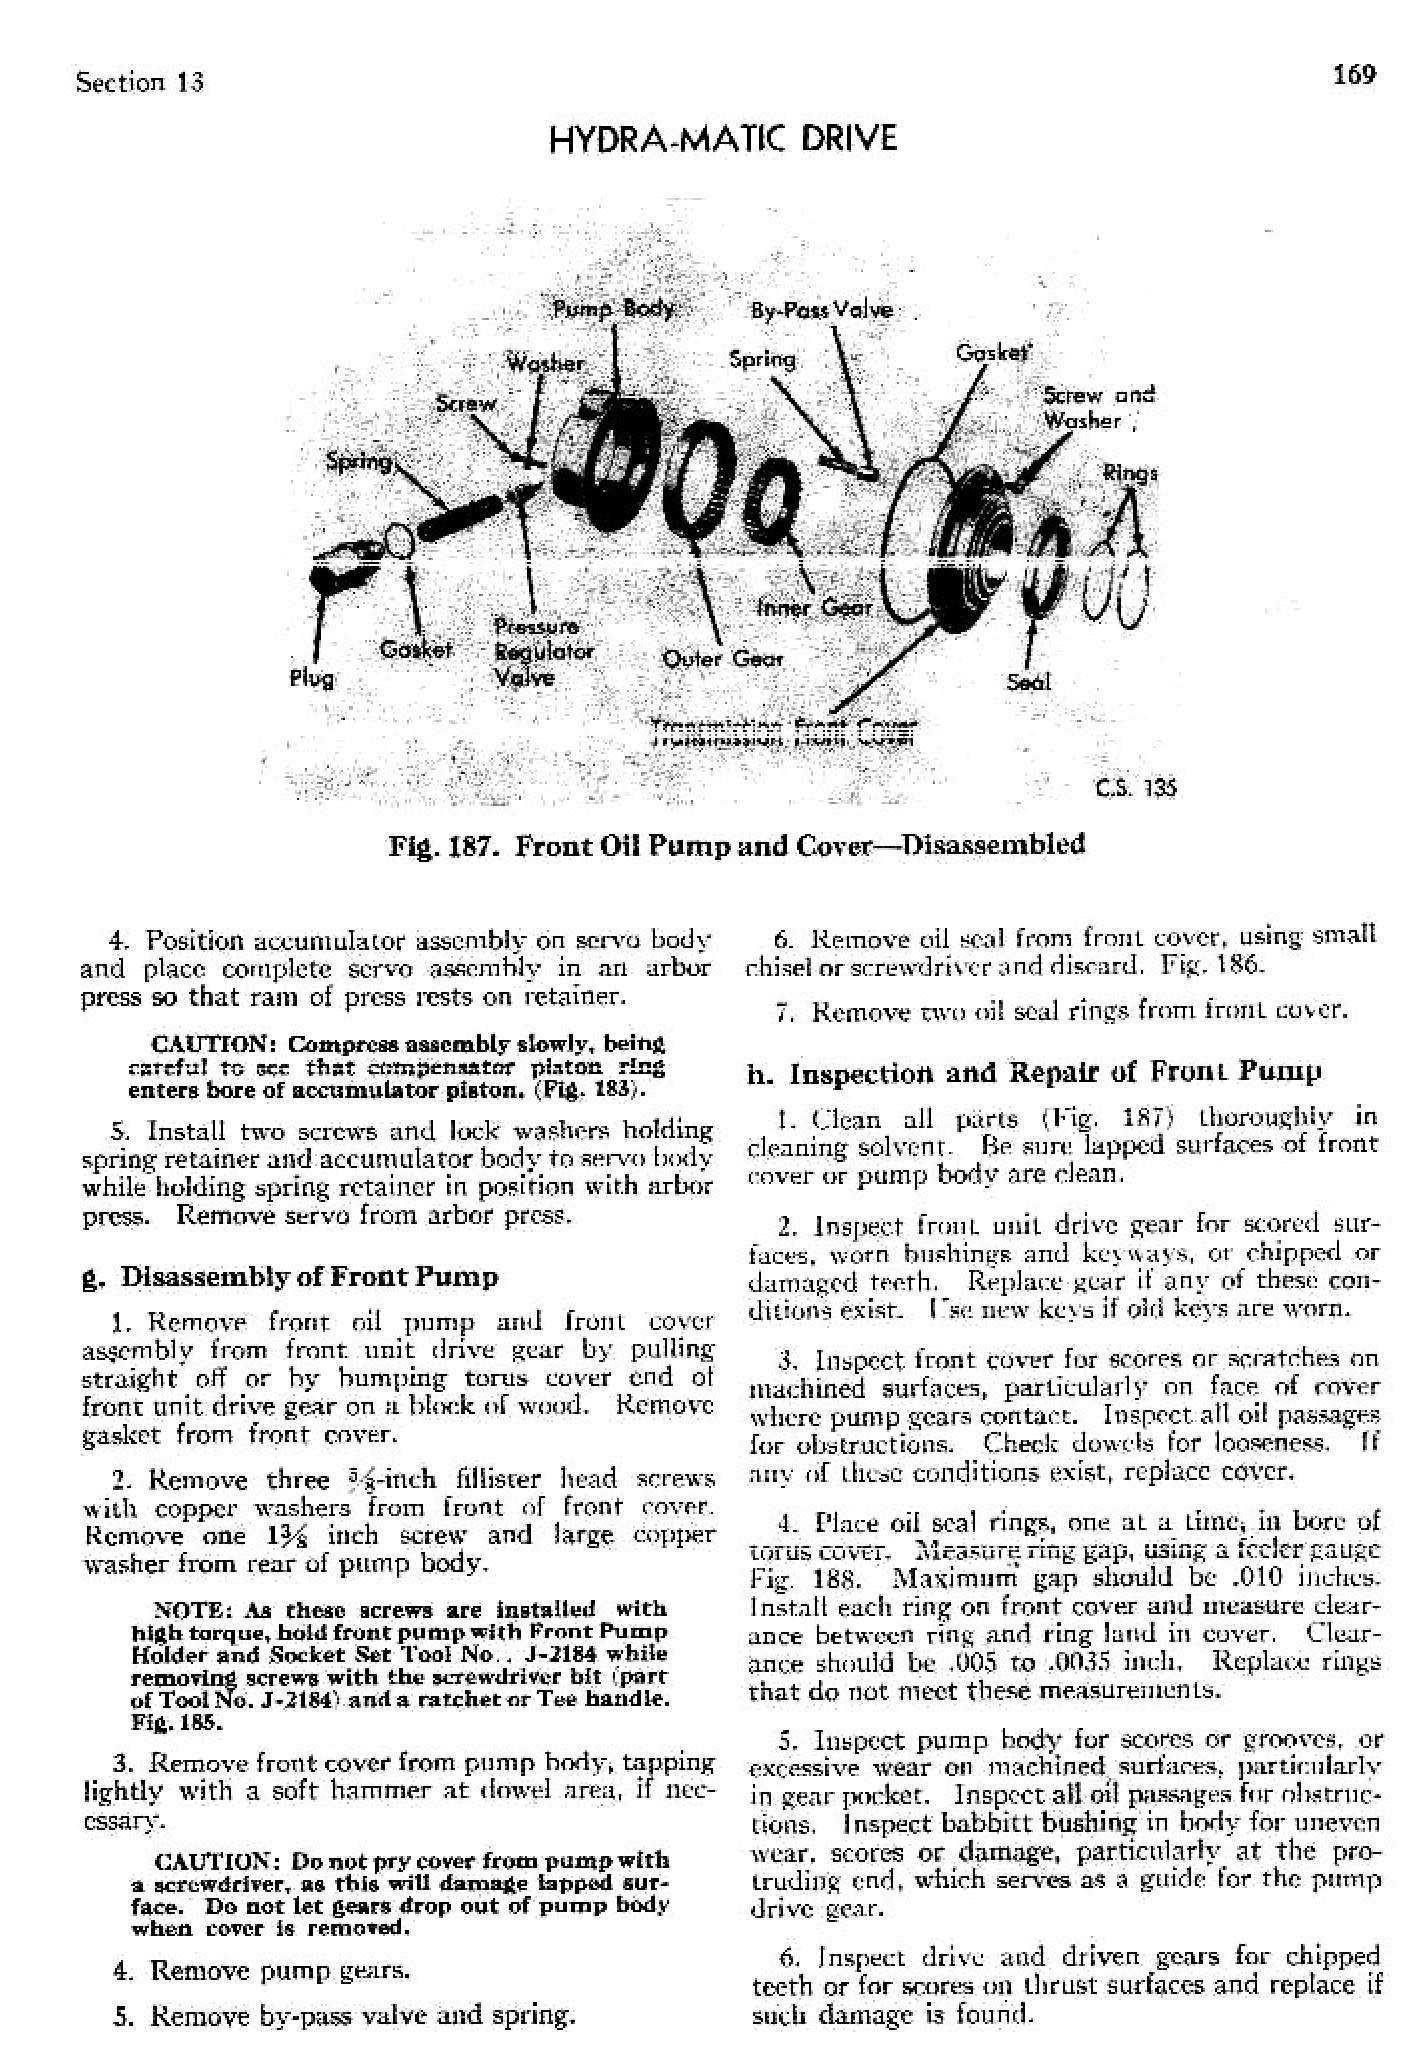 1949 Cadillac Shop Manual- Hydra-Matic Page 24 of 39